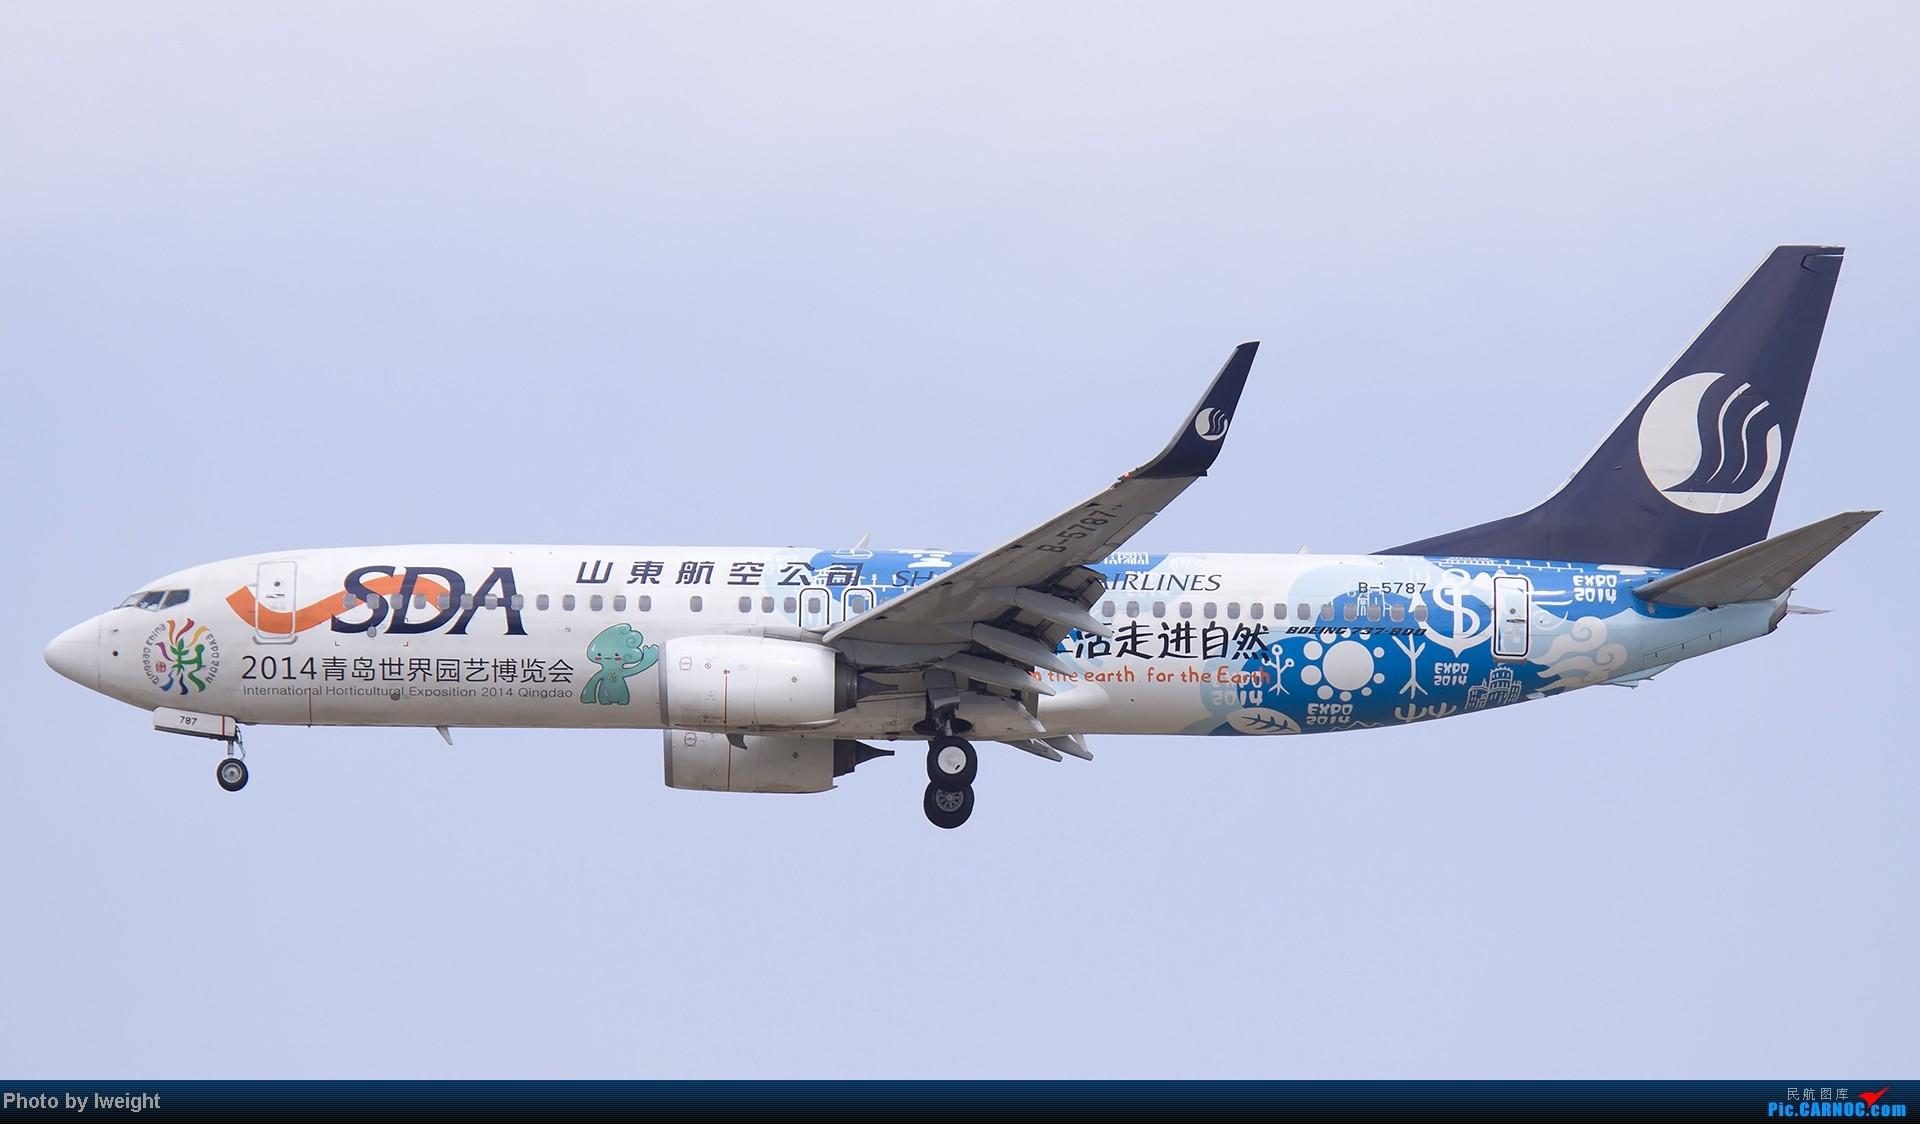 Re:[原创]北京难得的好天气,收获多种机型和彩绘,遗憾的是再次错过卡航巴塞罗那彩绘 BOEING 737-800 B-5787 中国北京首都机场